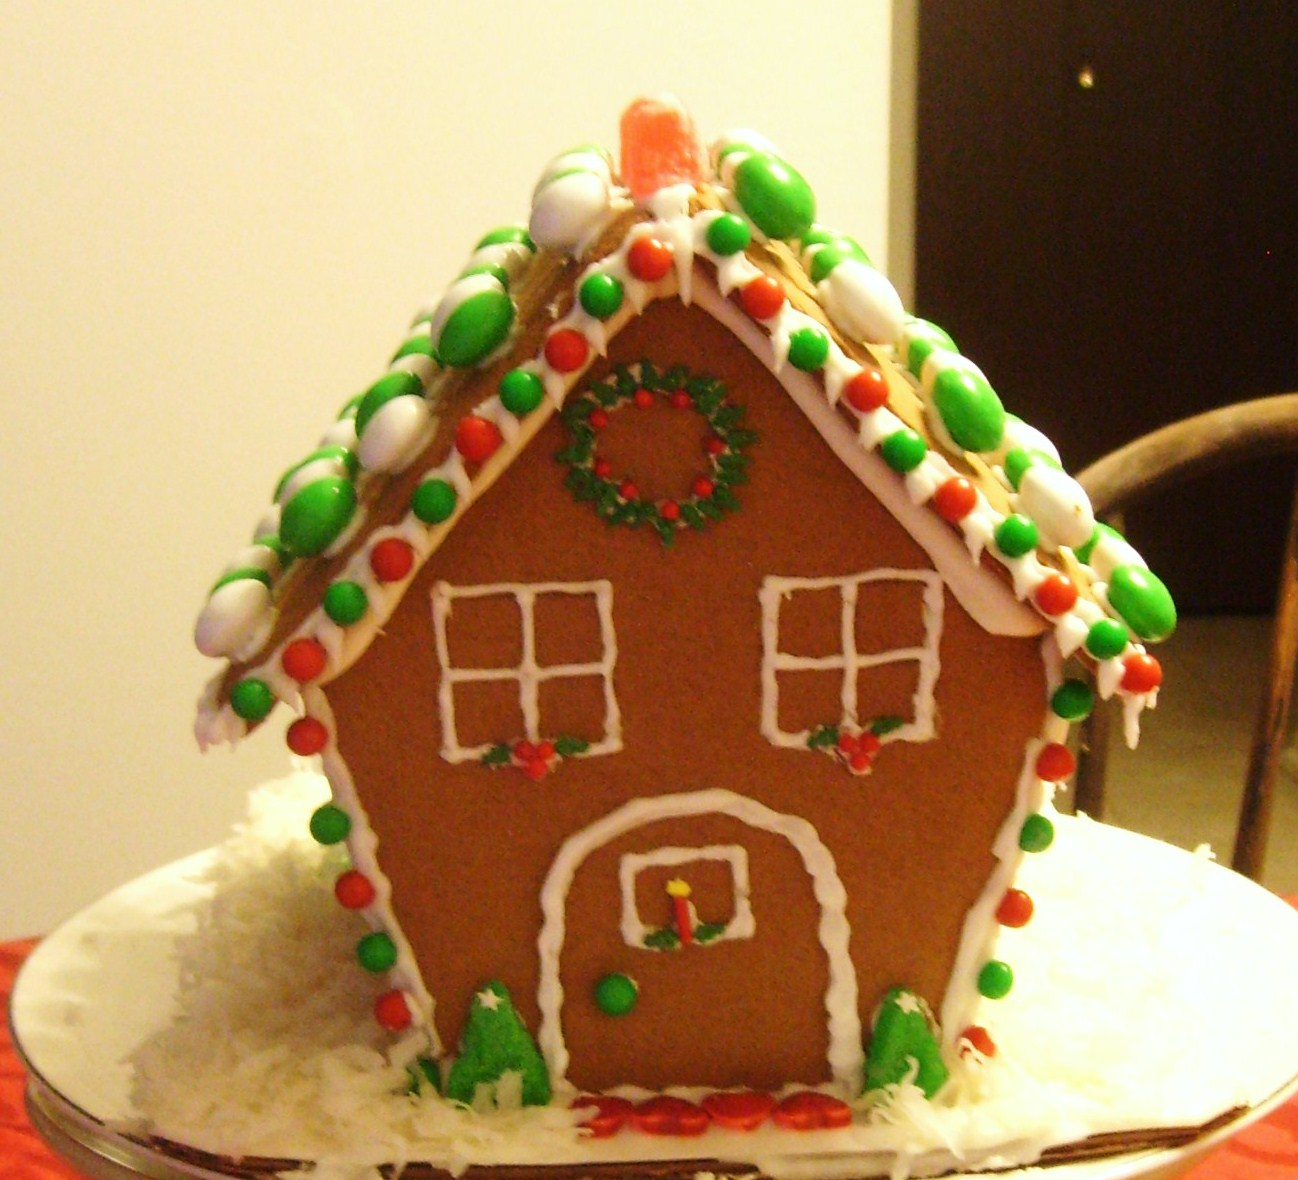 Back & Simple Savory u0026 Satisfying: Gingerbread House Decoration Ideas